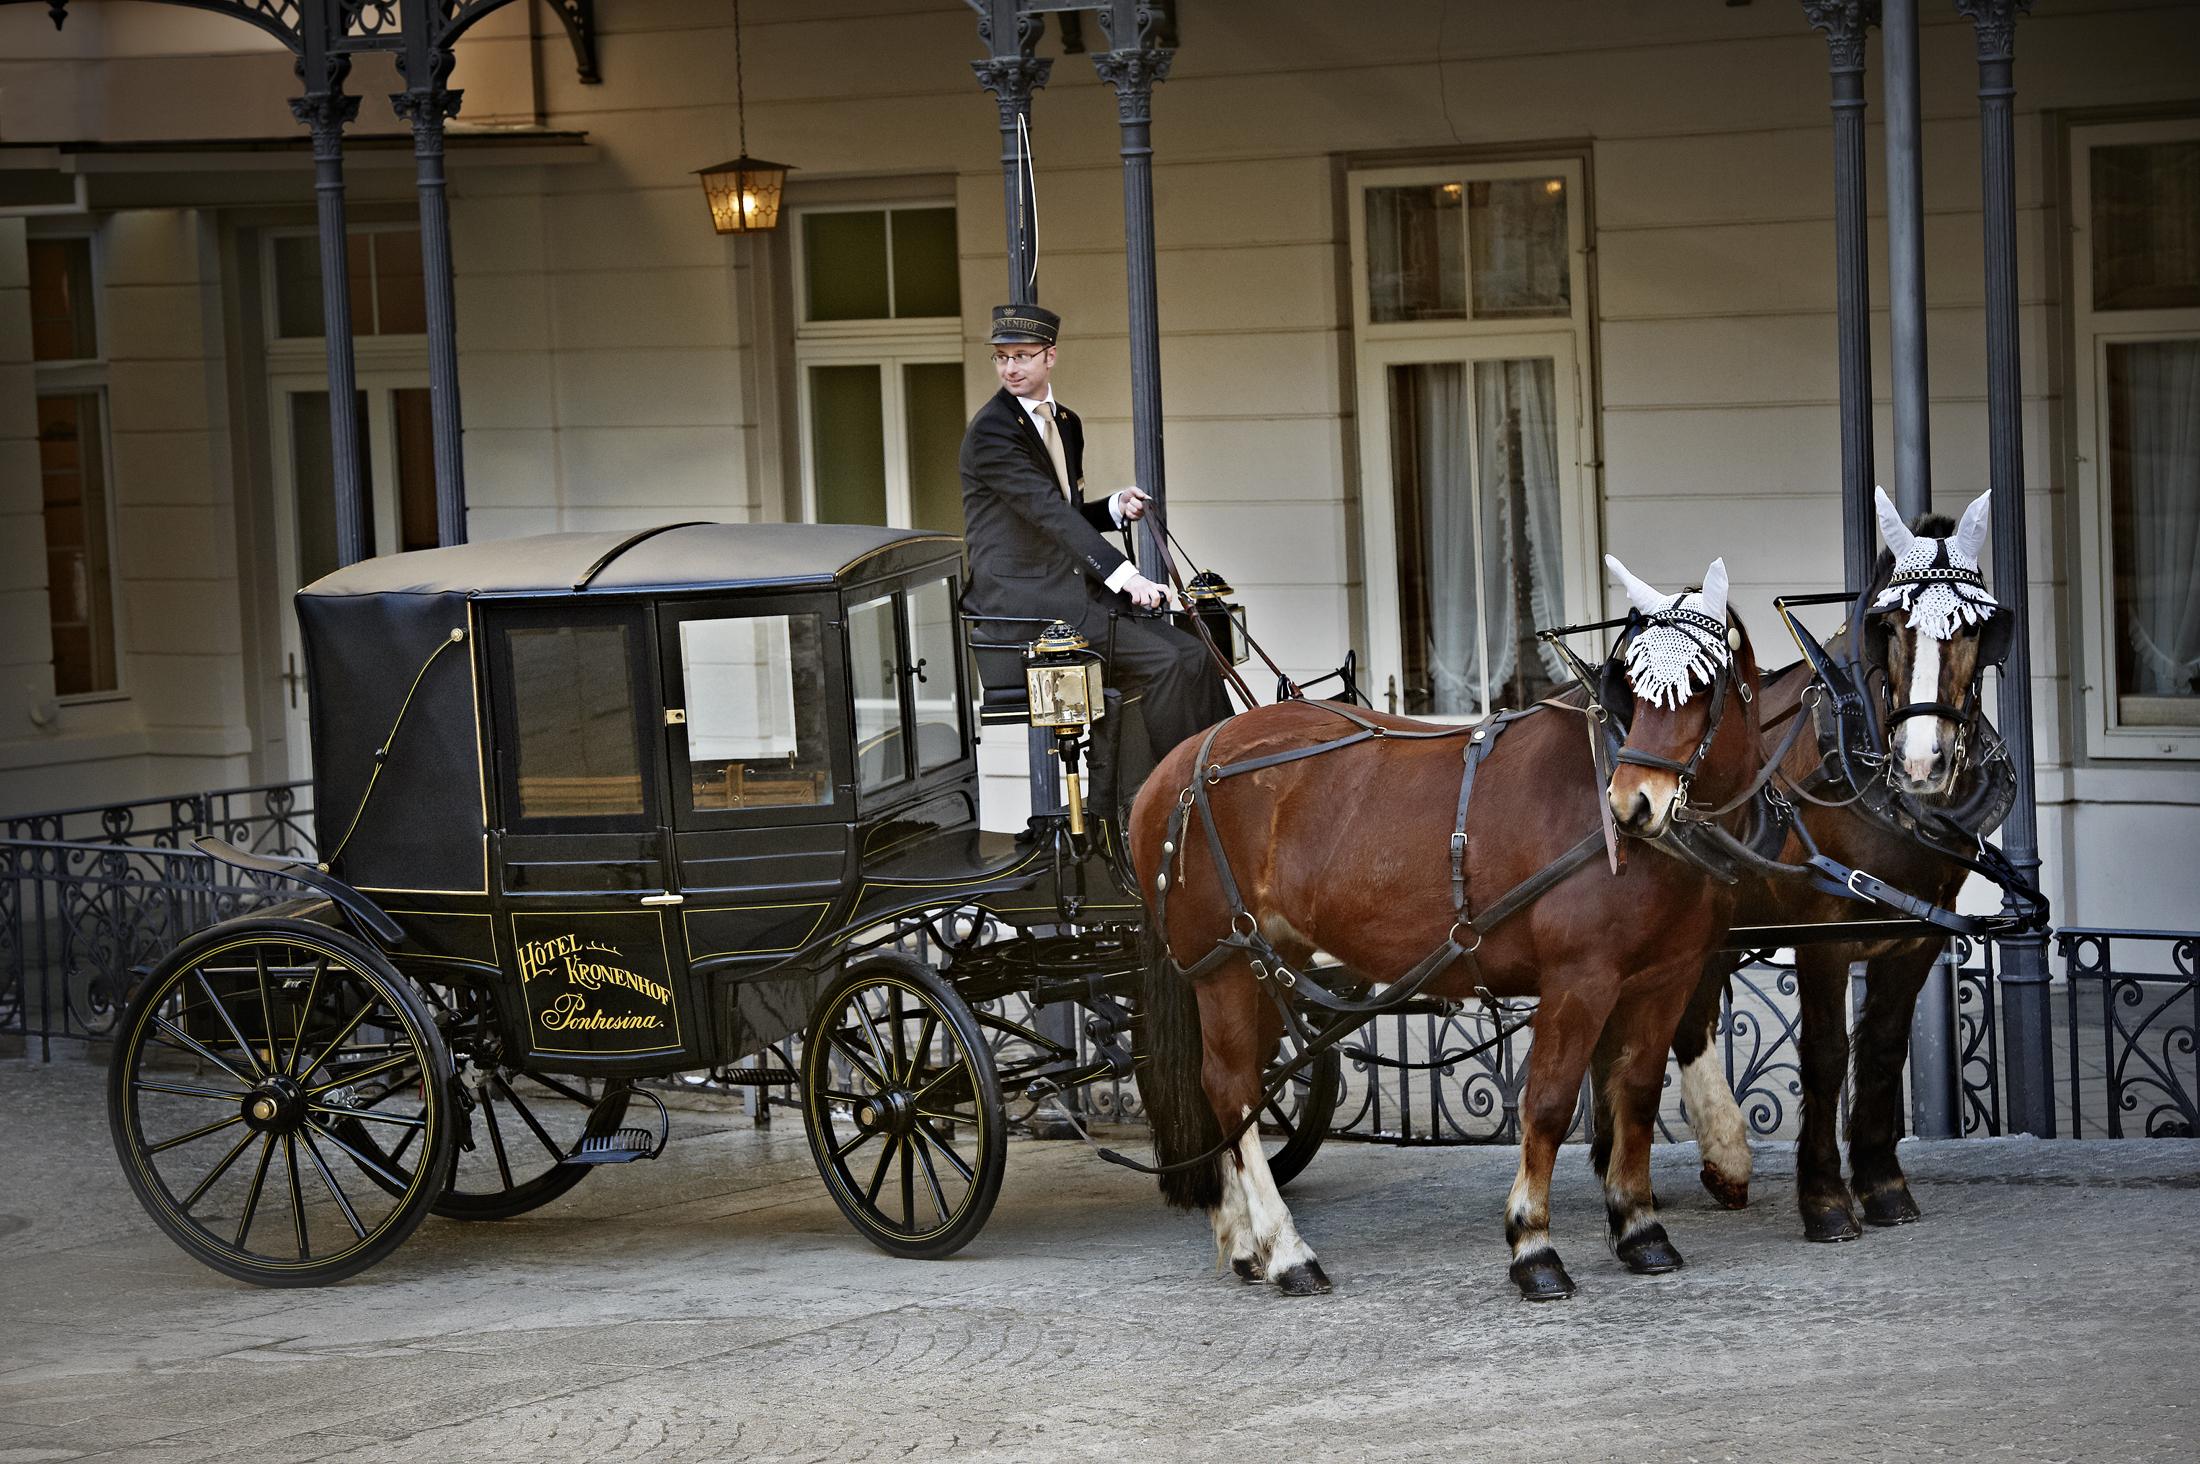 Kronenhof_Horse carriage.jpg